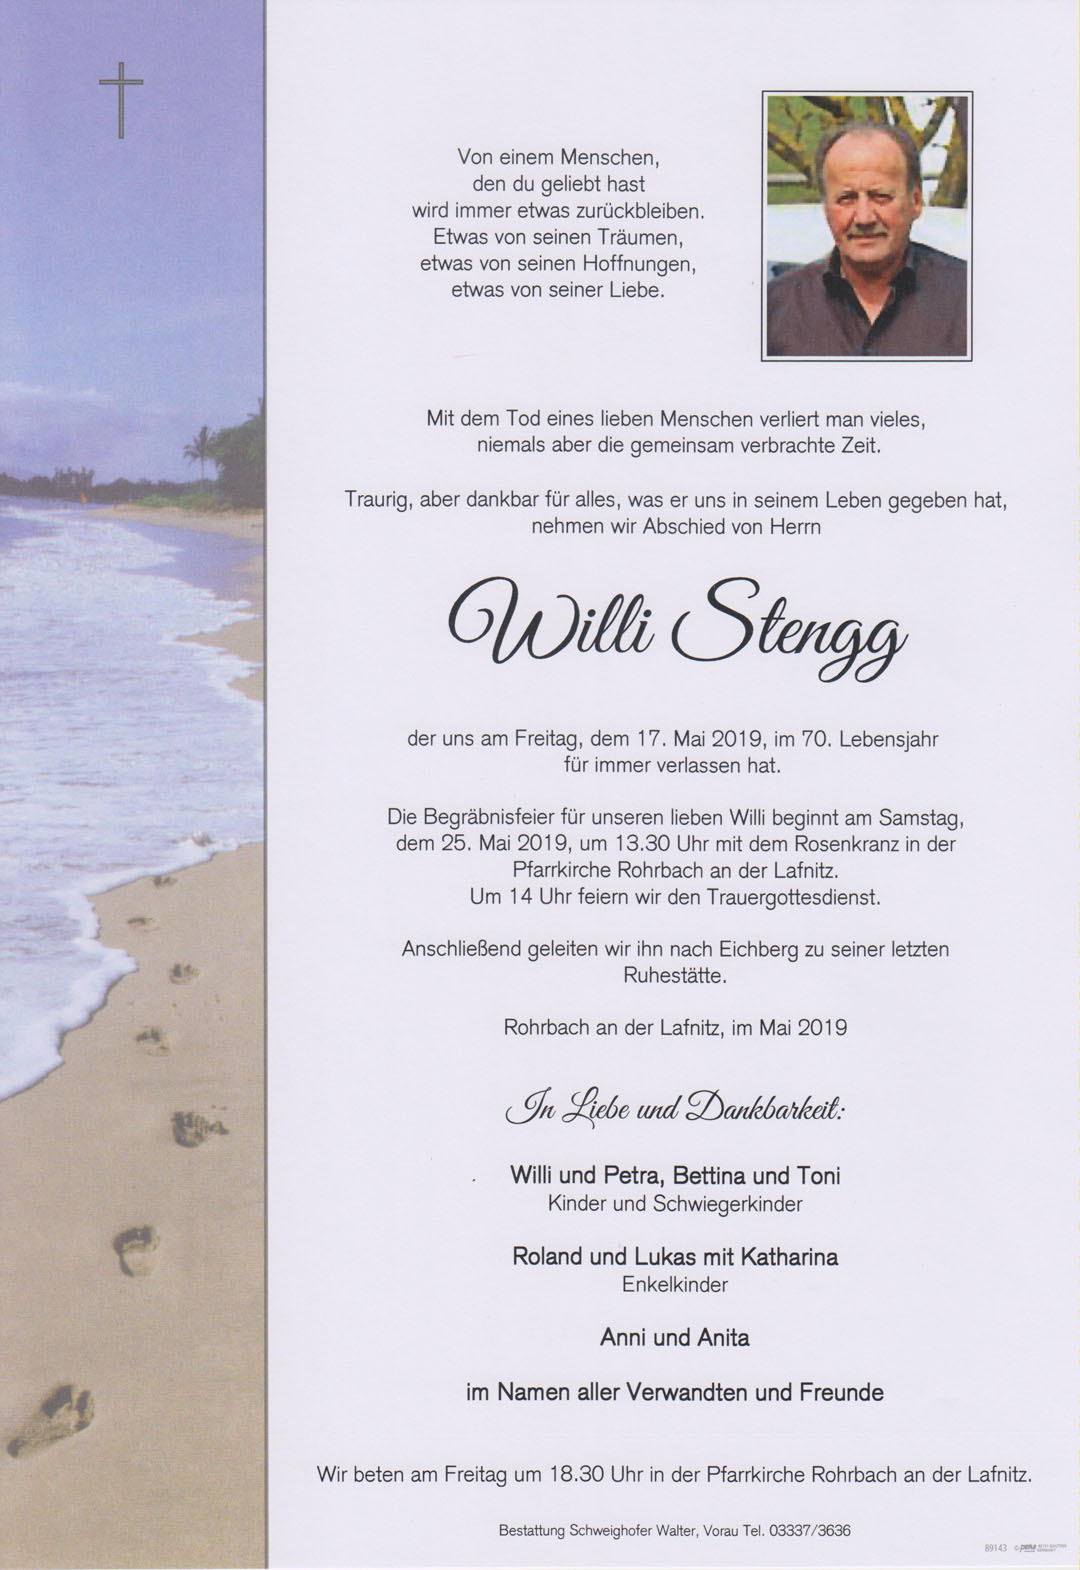 Willi Stengg